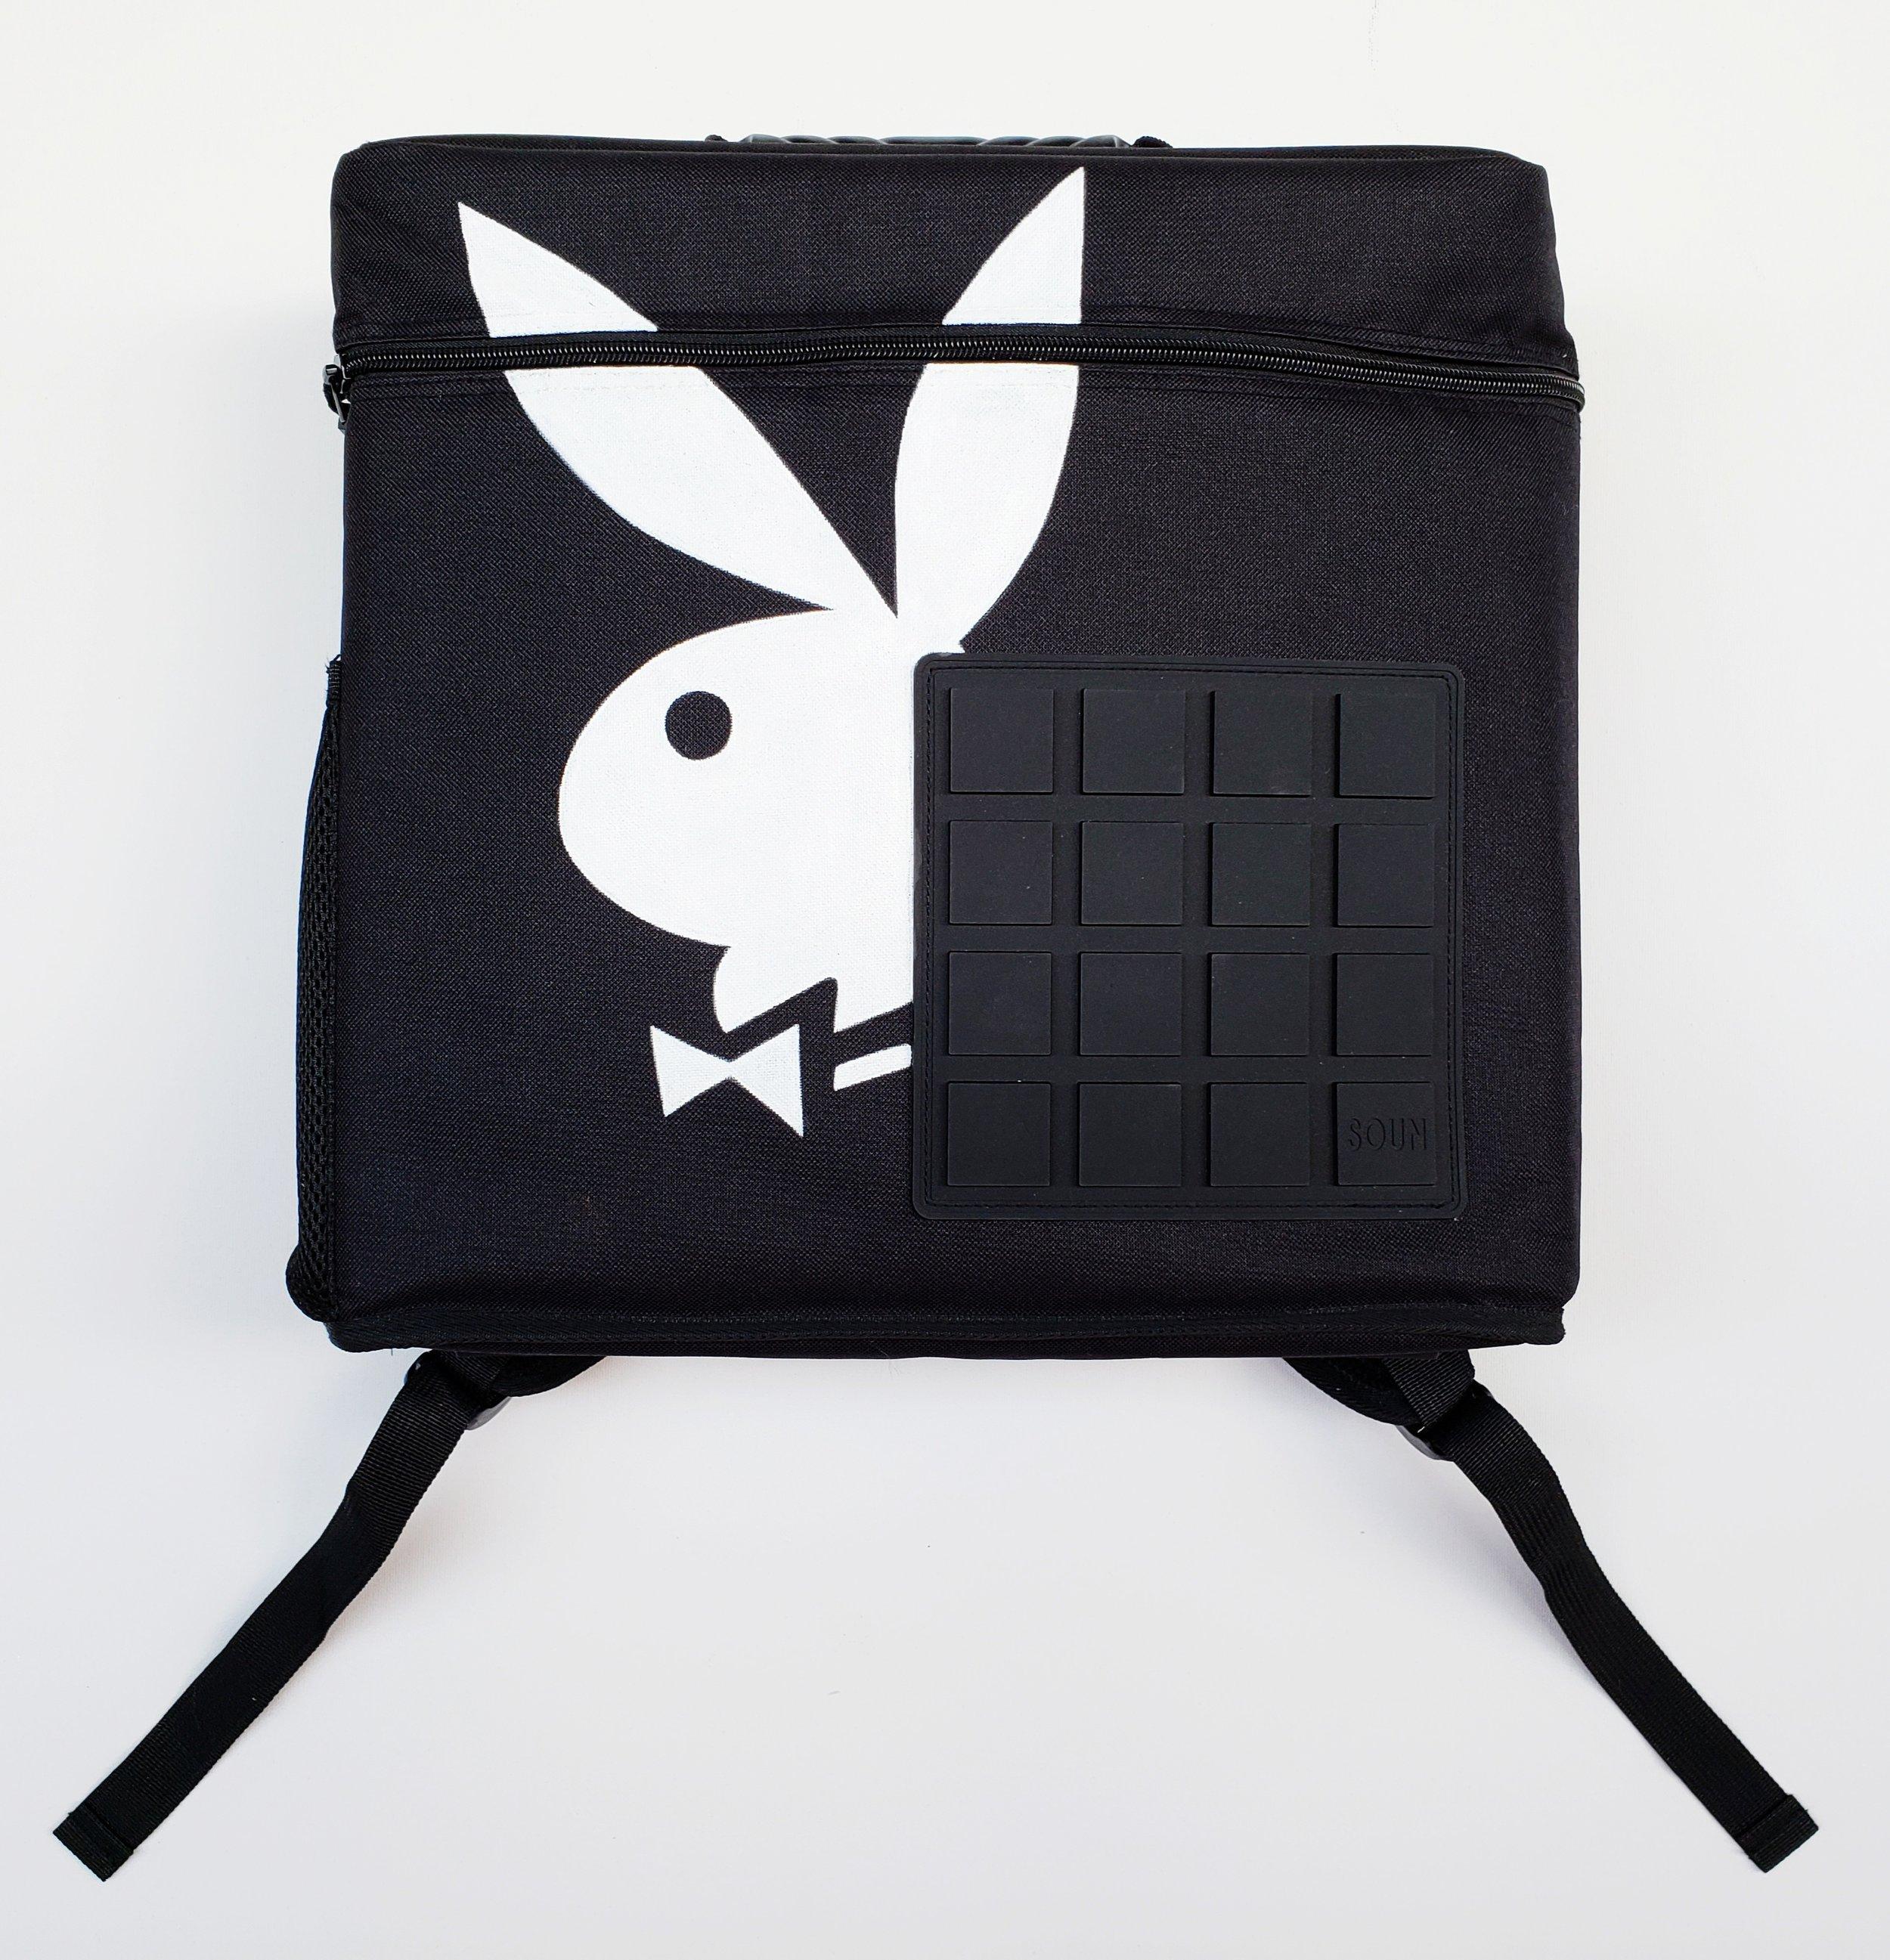 Playboy Logo Design on SounBag